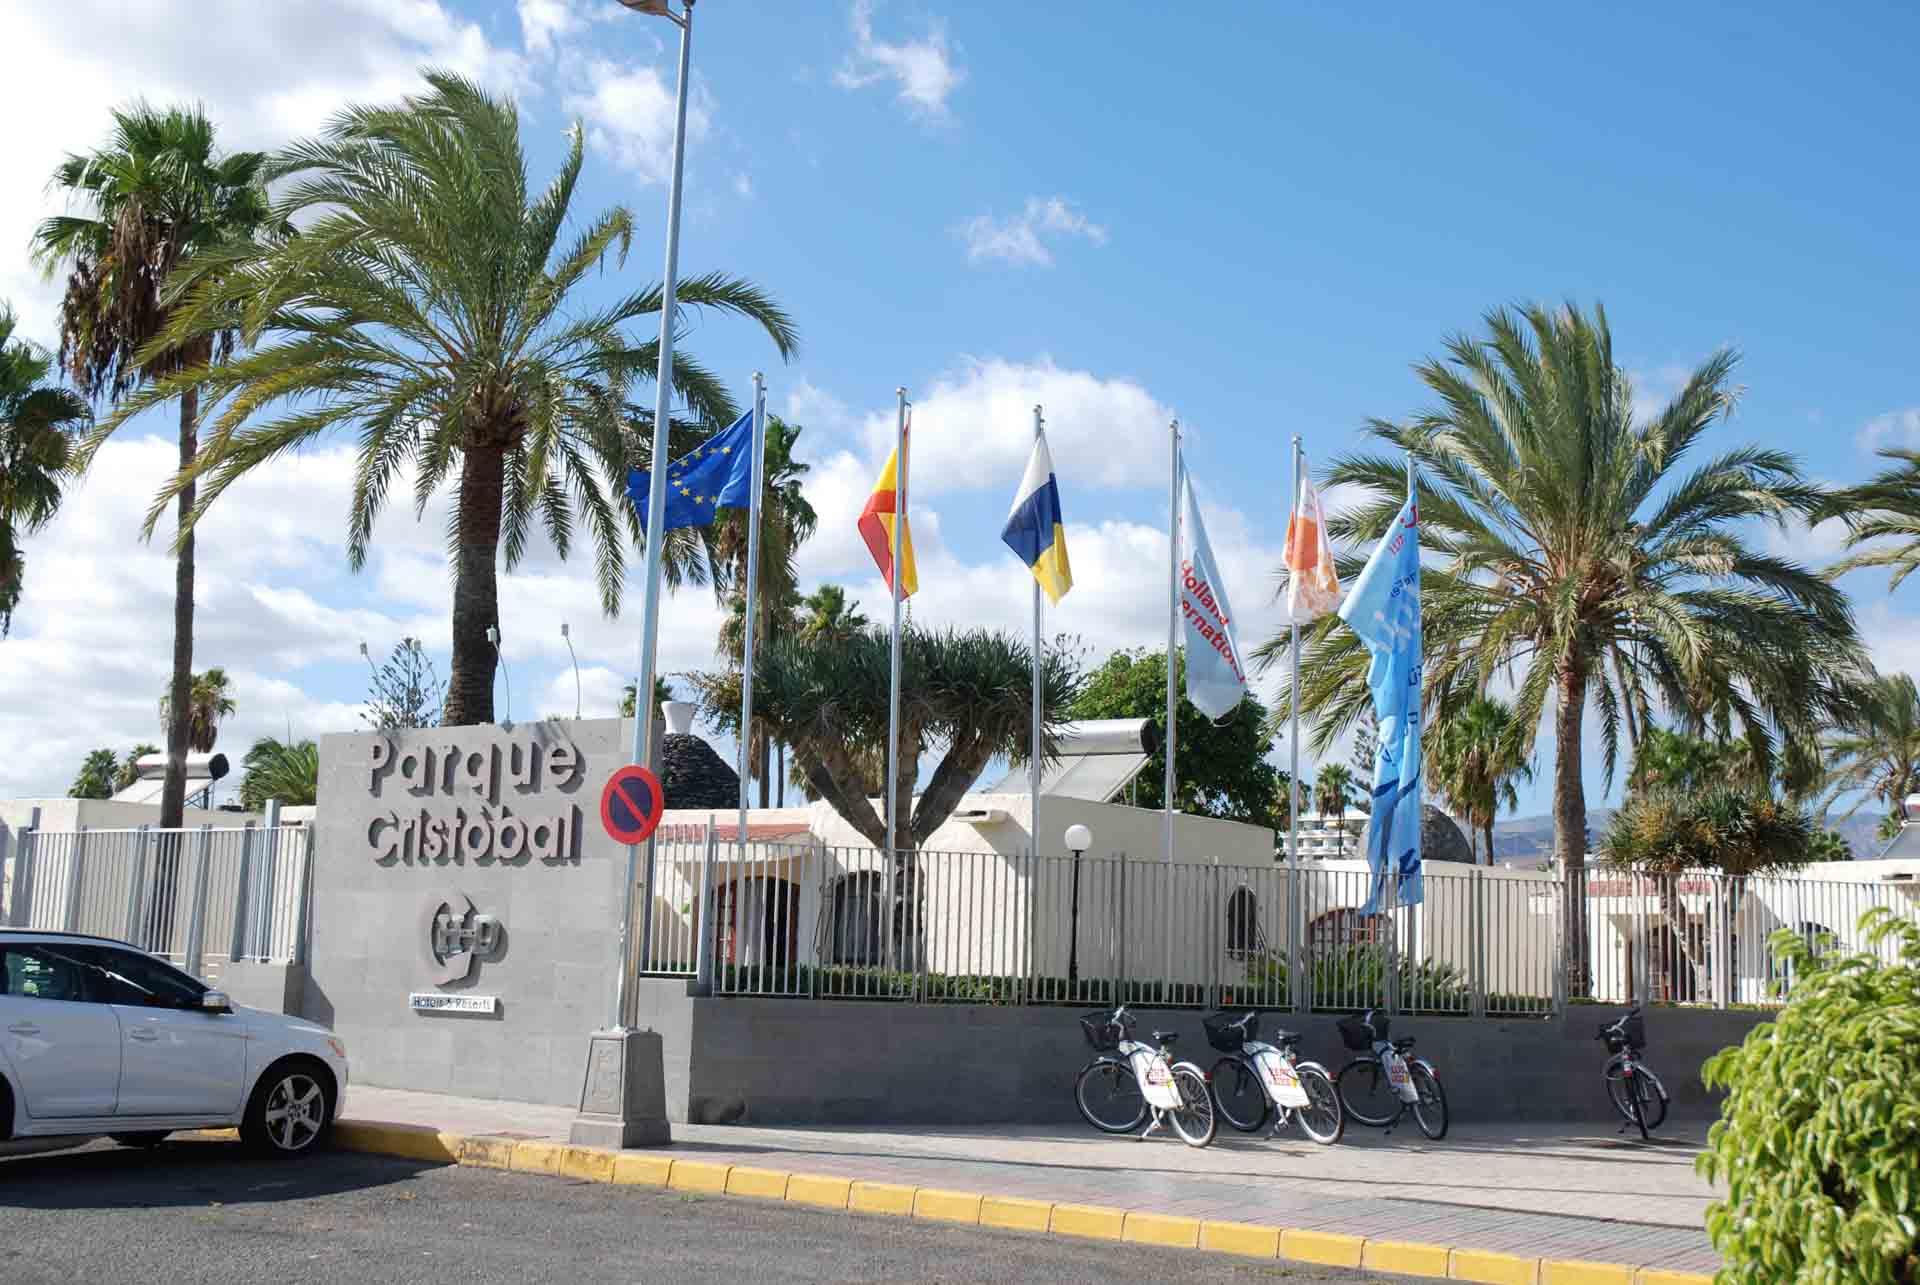 EST para producción de ACS y climatización de piscinas en Bungalows Parque Cristóbal Tenerife